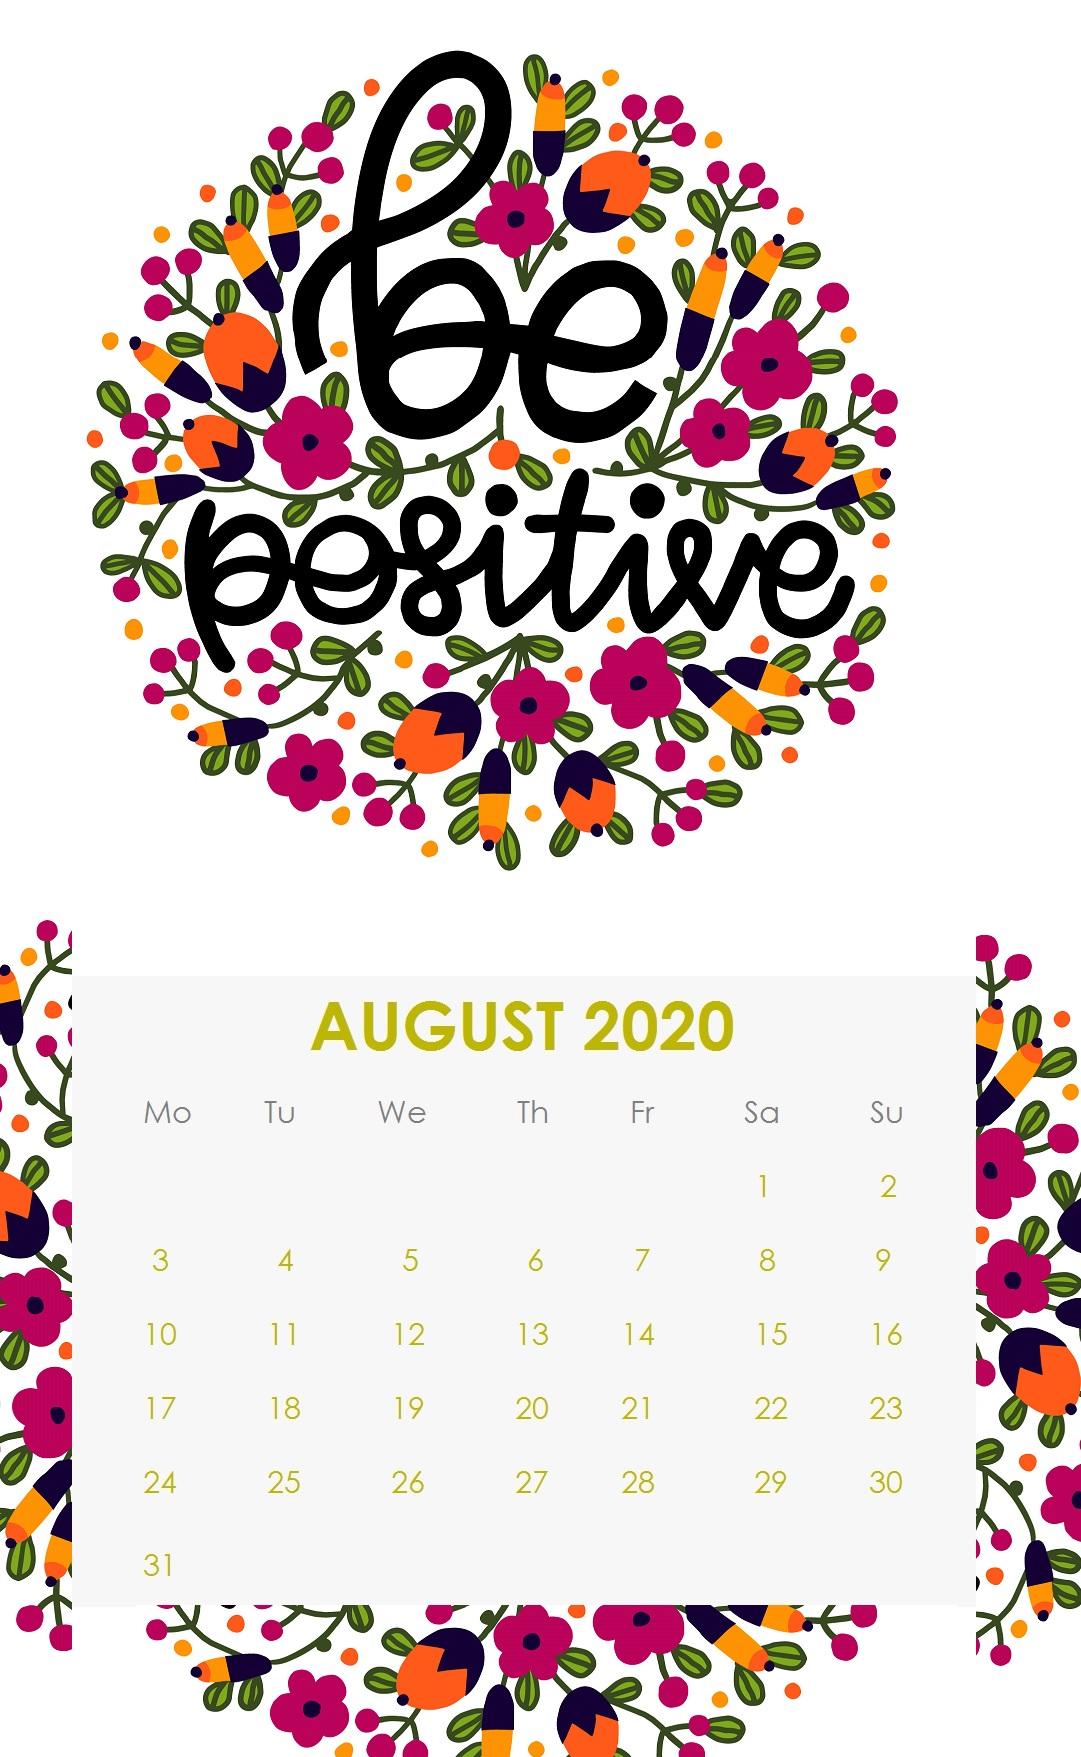 Floral August 2020 Quotes Calendar